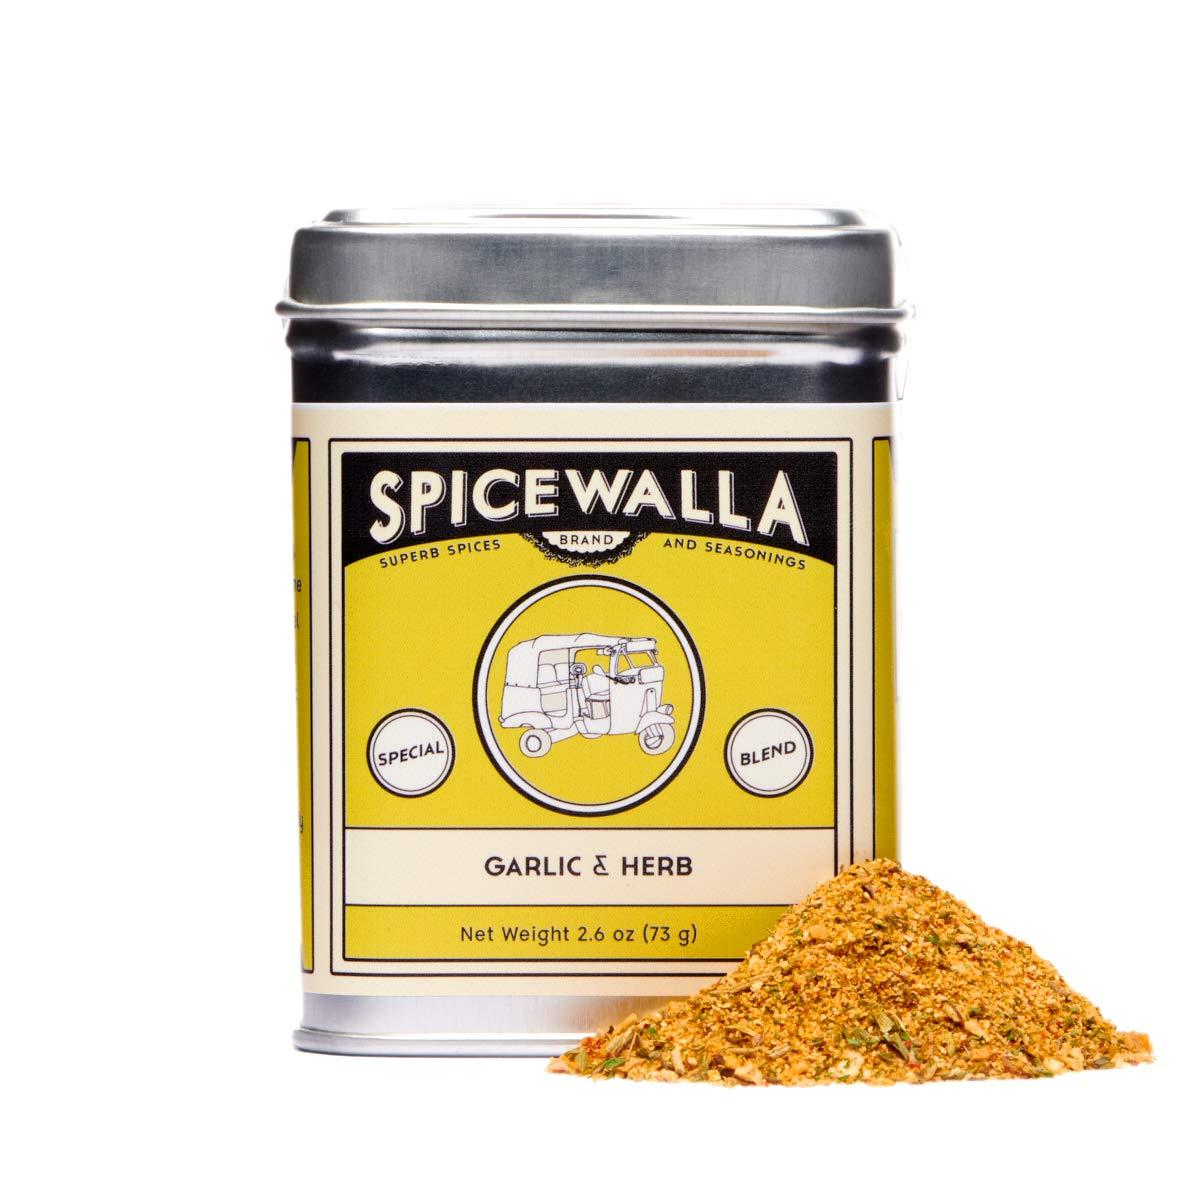 Spicewalla Garlic Herb Seasoning 2.6 oz   Salt Free, No MSG, Non GMO   Herbs and Spices Blend